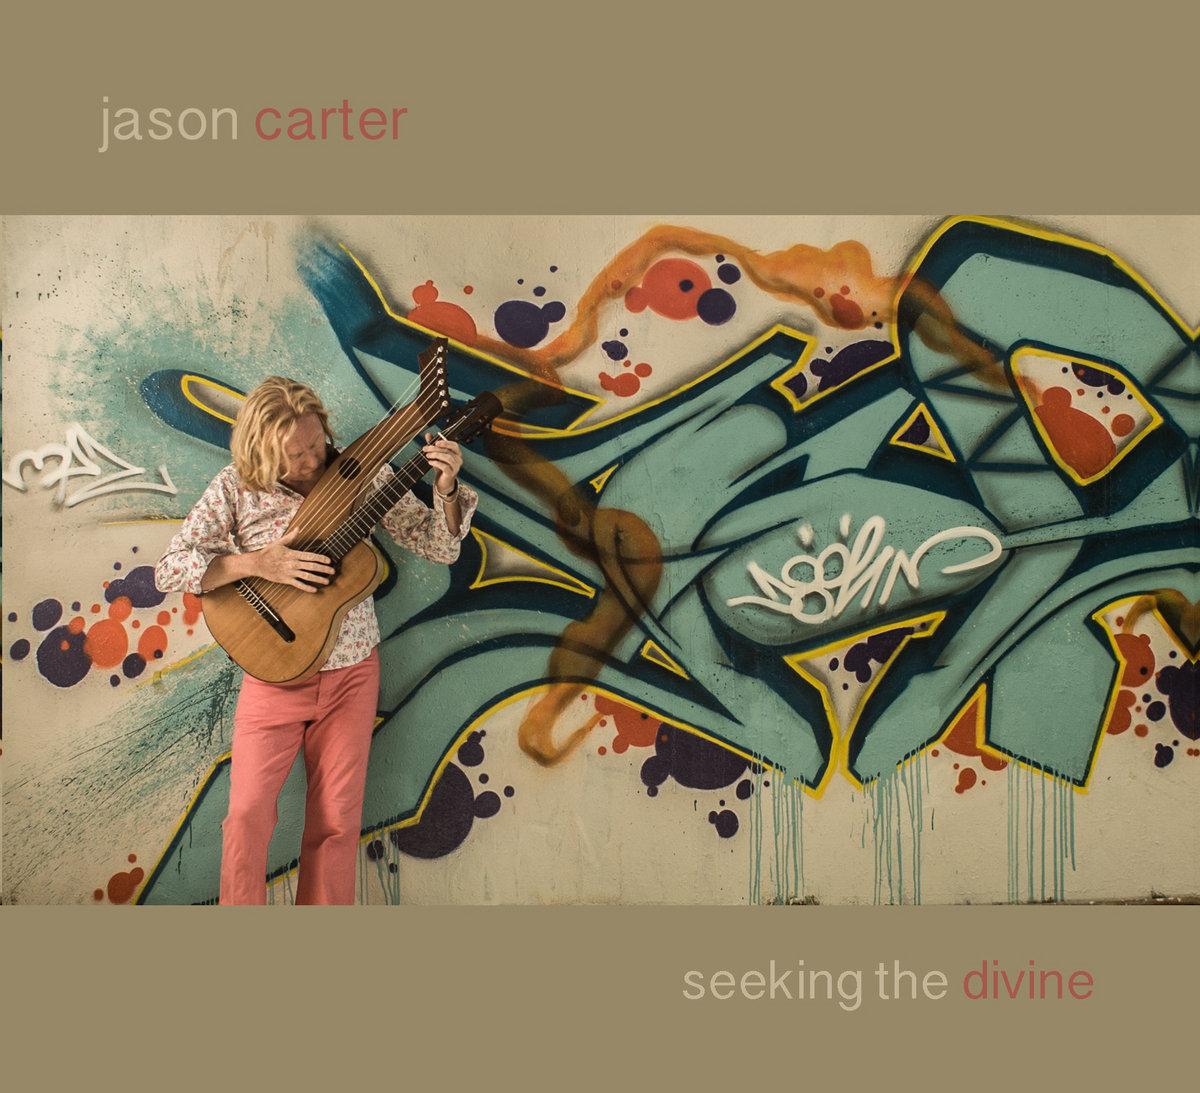 Guten Morgen Mein Engel Jason Carter